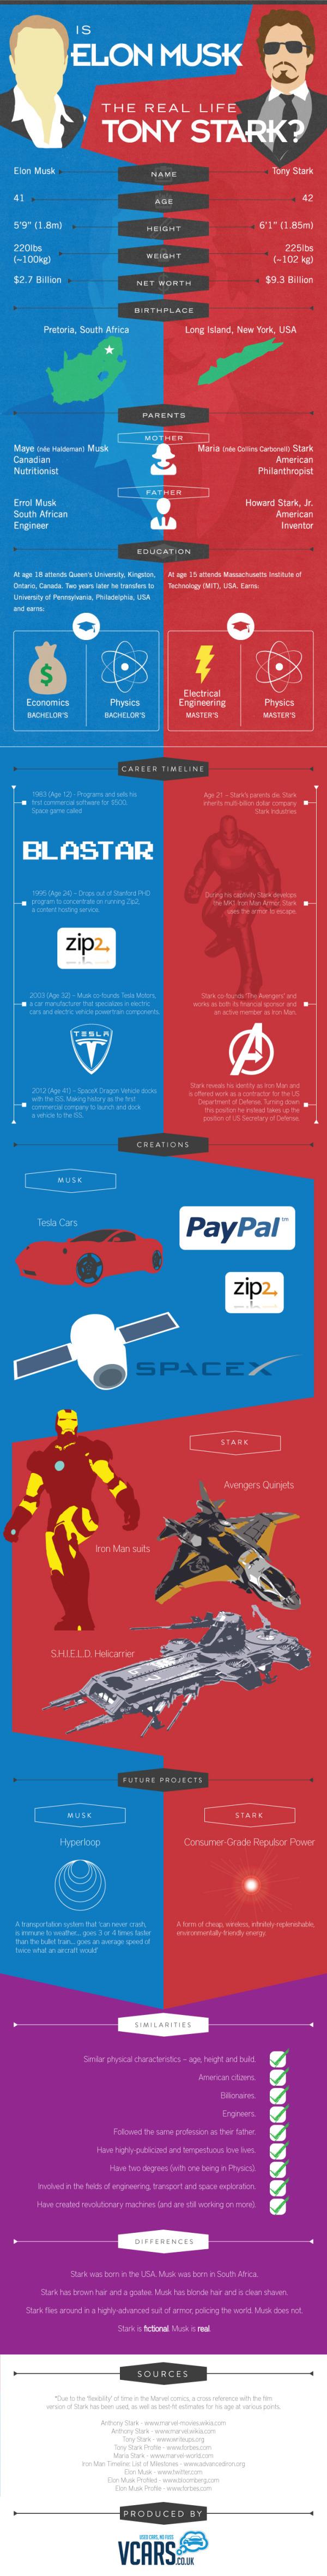 Is Elon Musk The Real Life Tony Stark? infographic